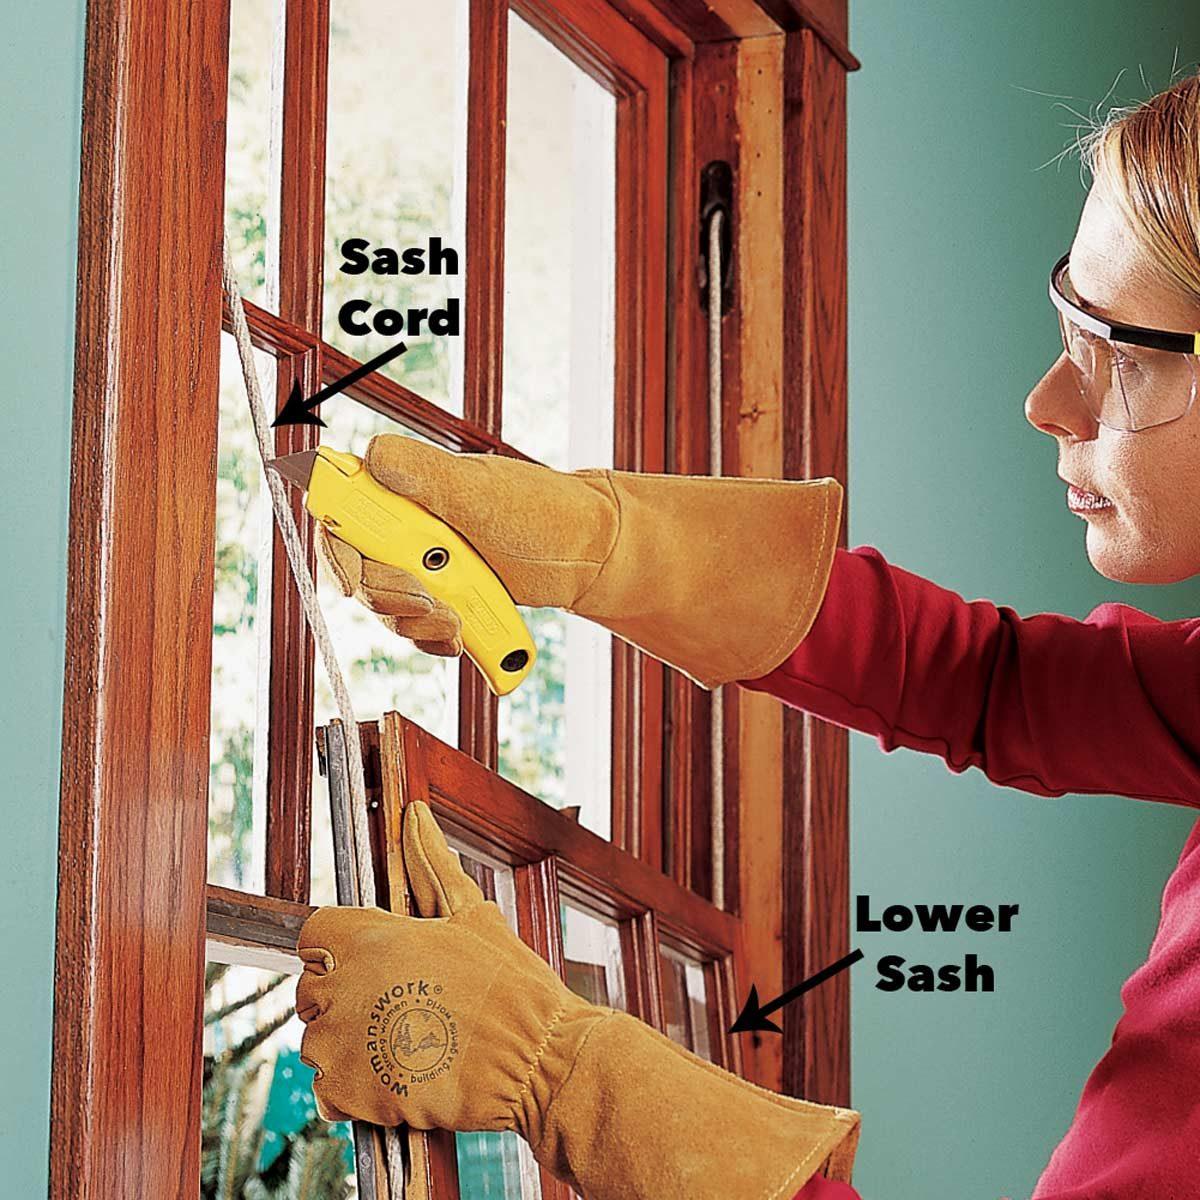 remove the lower sash